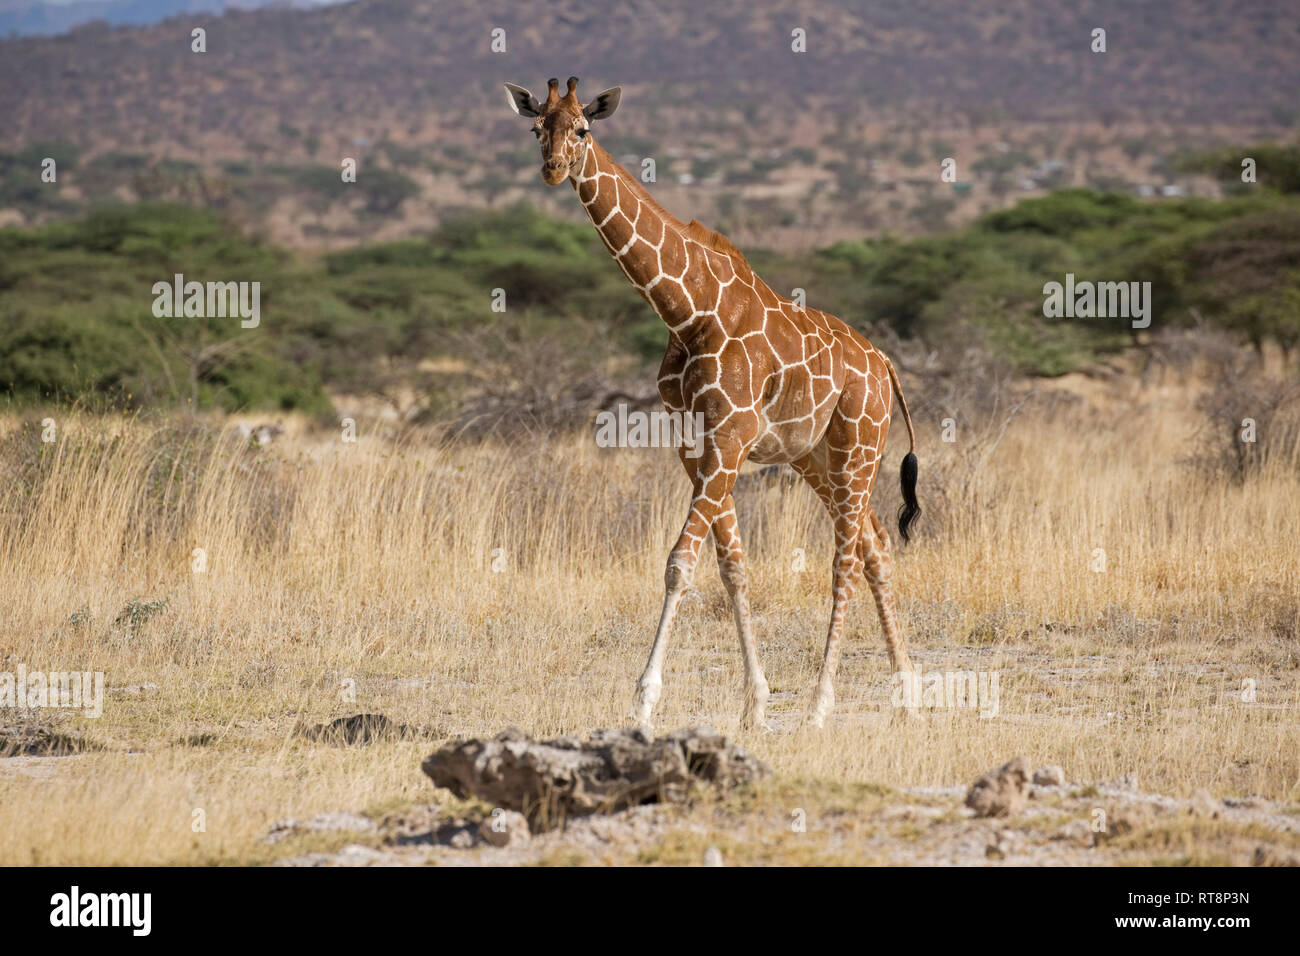 Reticulated or Somali giraffe, Giraffa camelopardalis reticulata, in semi-arid grassland, Buffalo Springs National Reserve, Kenya Stock Photo